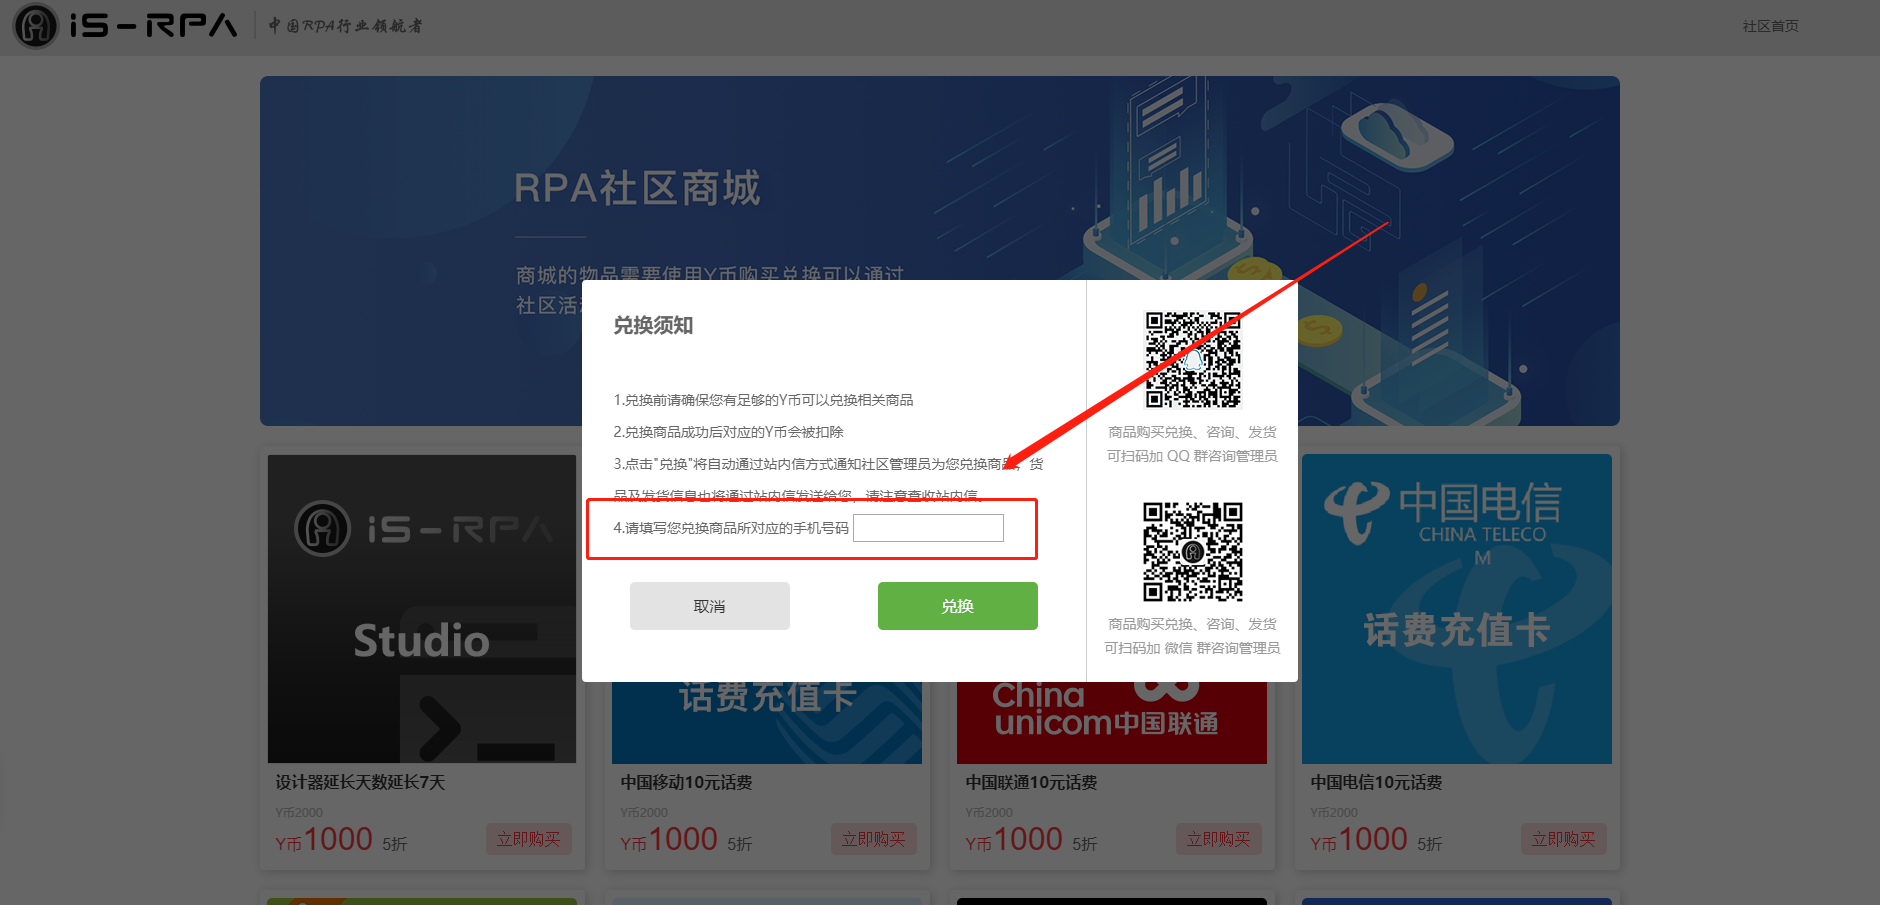 Y 币兑换系统,劲爆上线!!!(参与互动,壕礼相送)